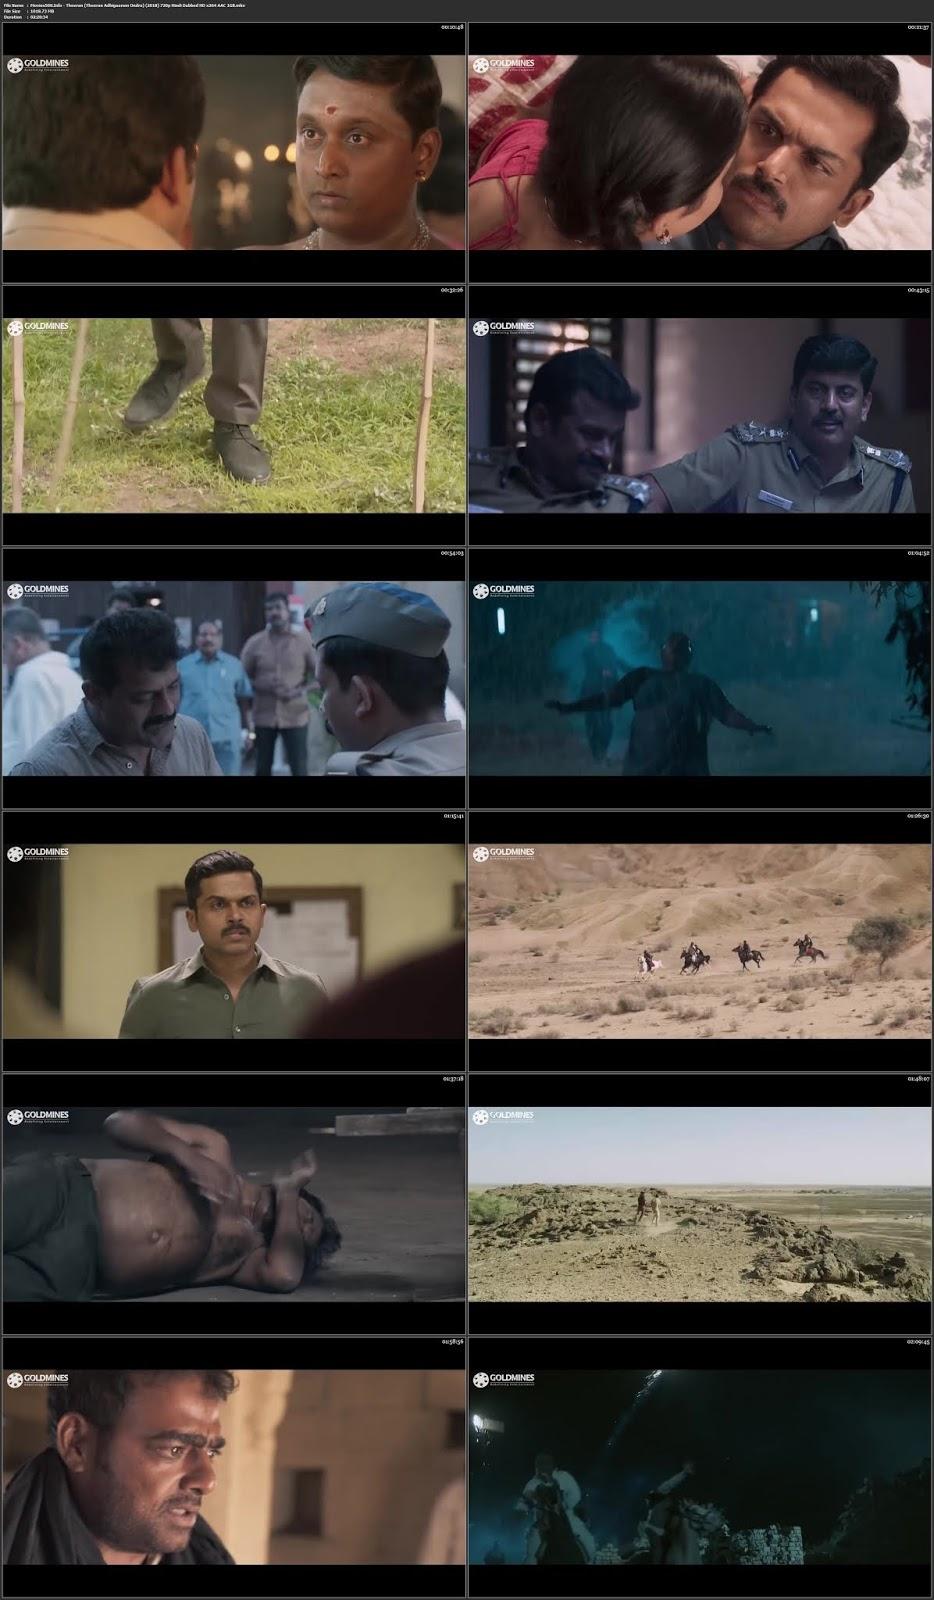 Theeran 2018 Hindi Dubbed Full Movie HDRip 720p 1GB